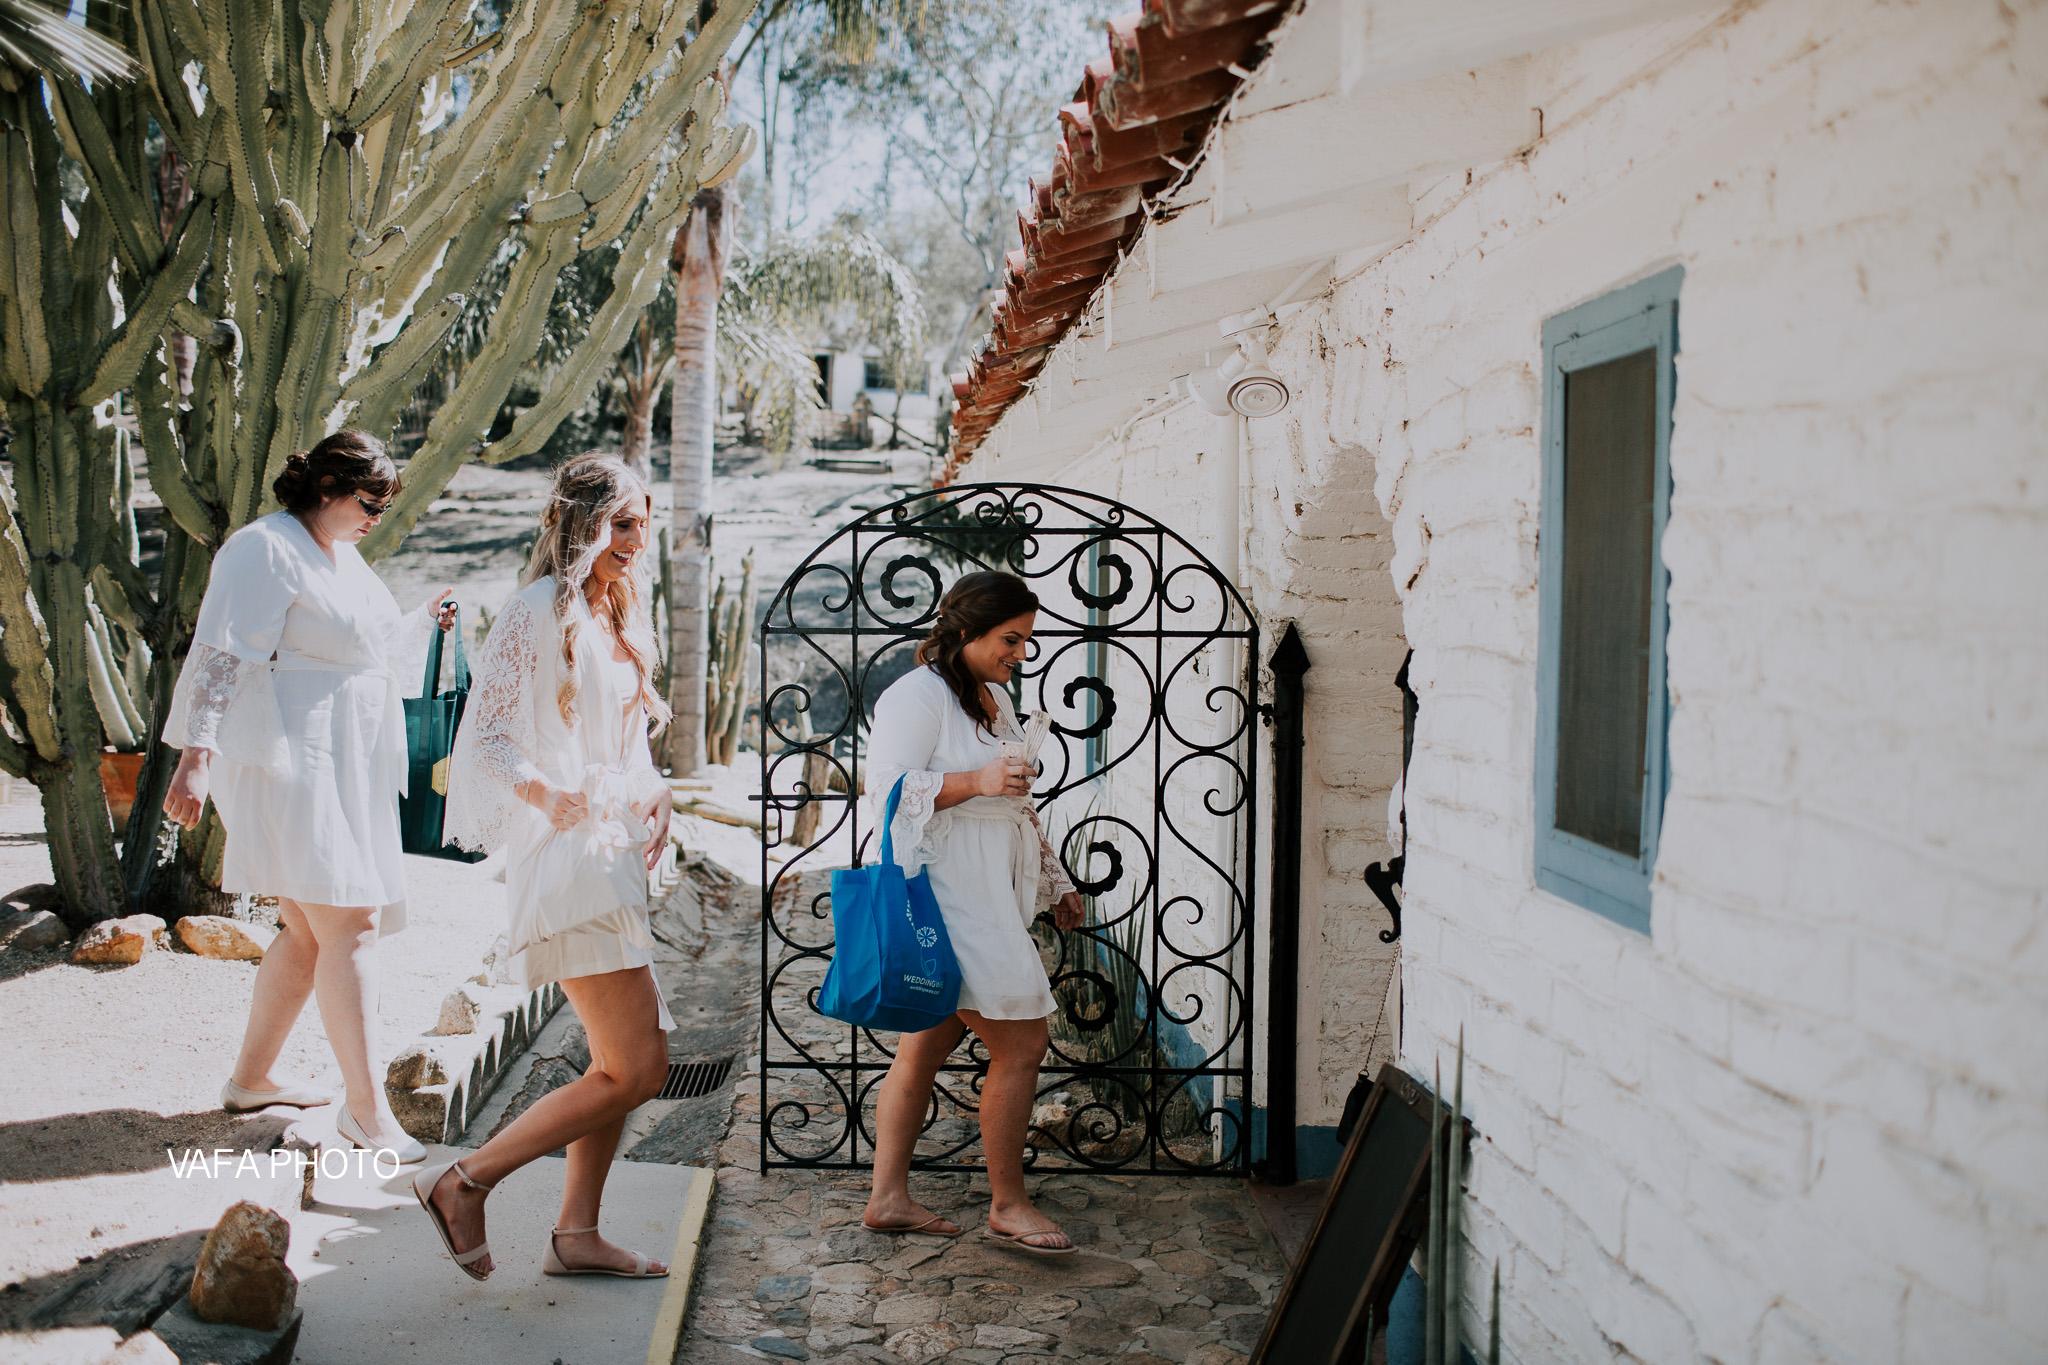 Leo-Carrillo-Ranch-Wedding-Lauren-Mike-Vafa-Photo-83.jpg